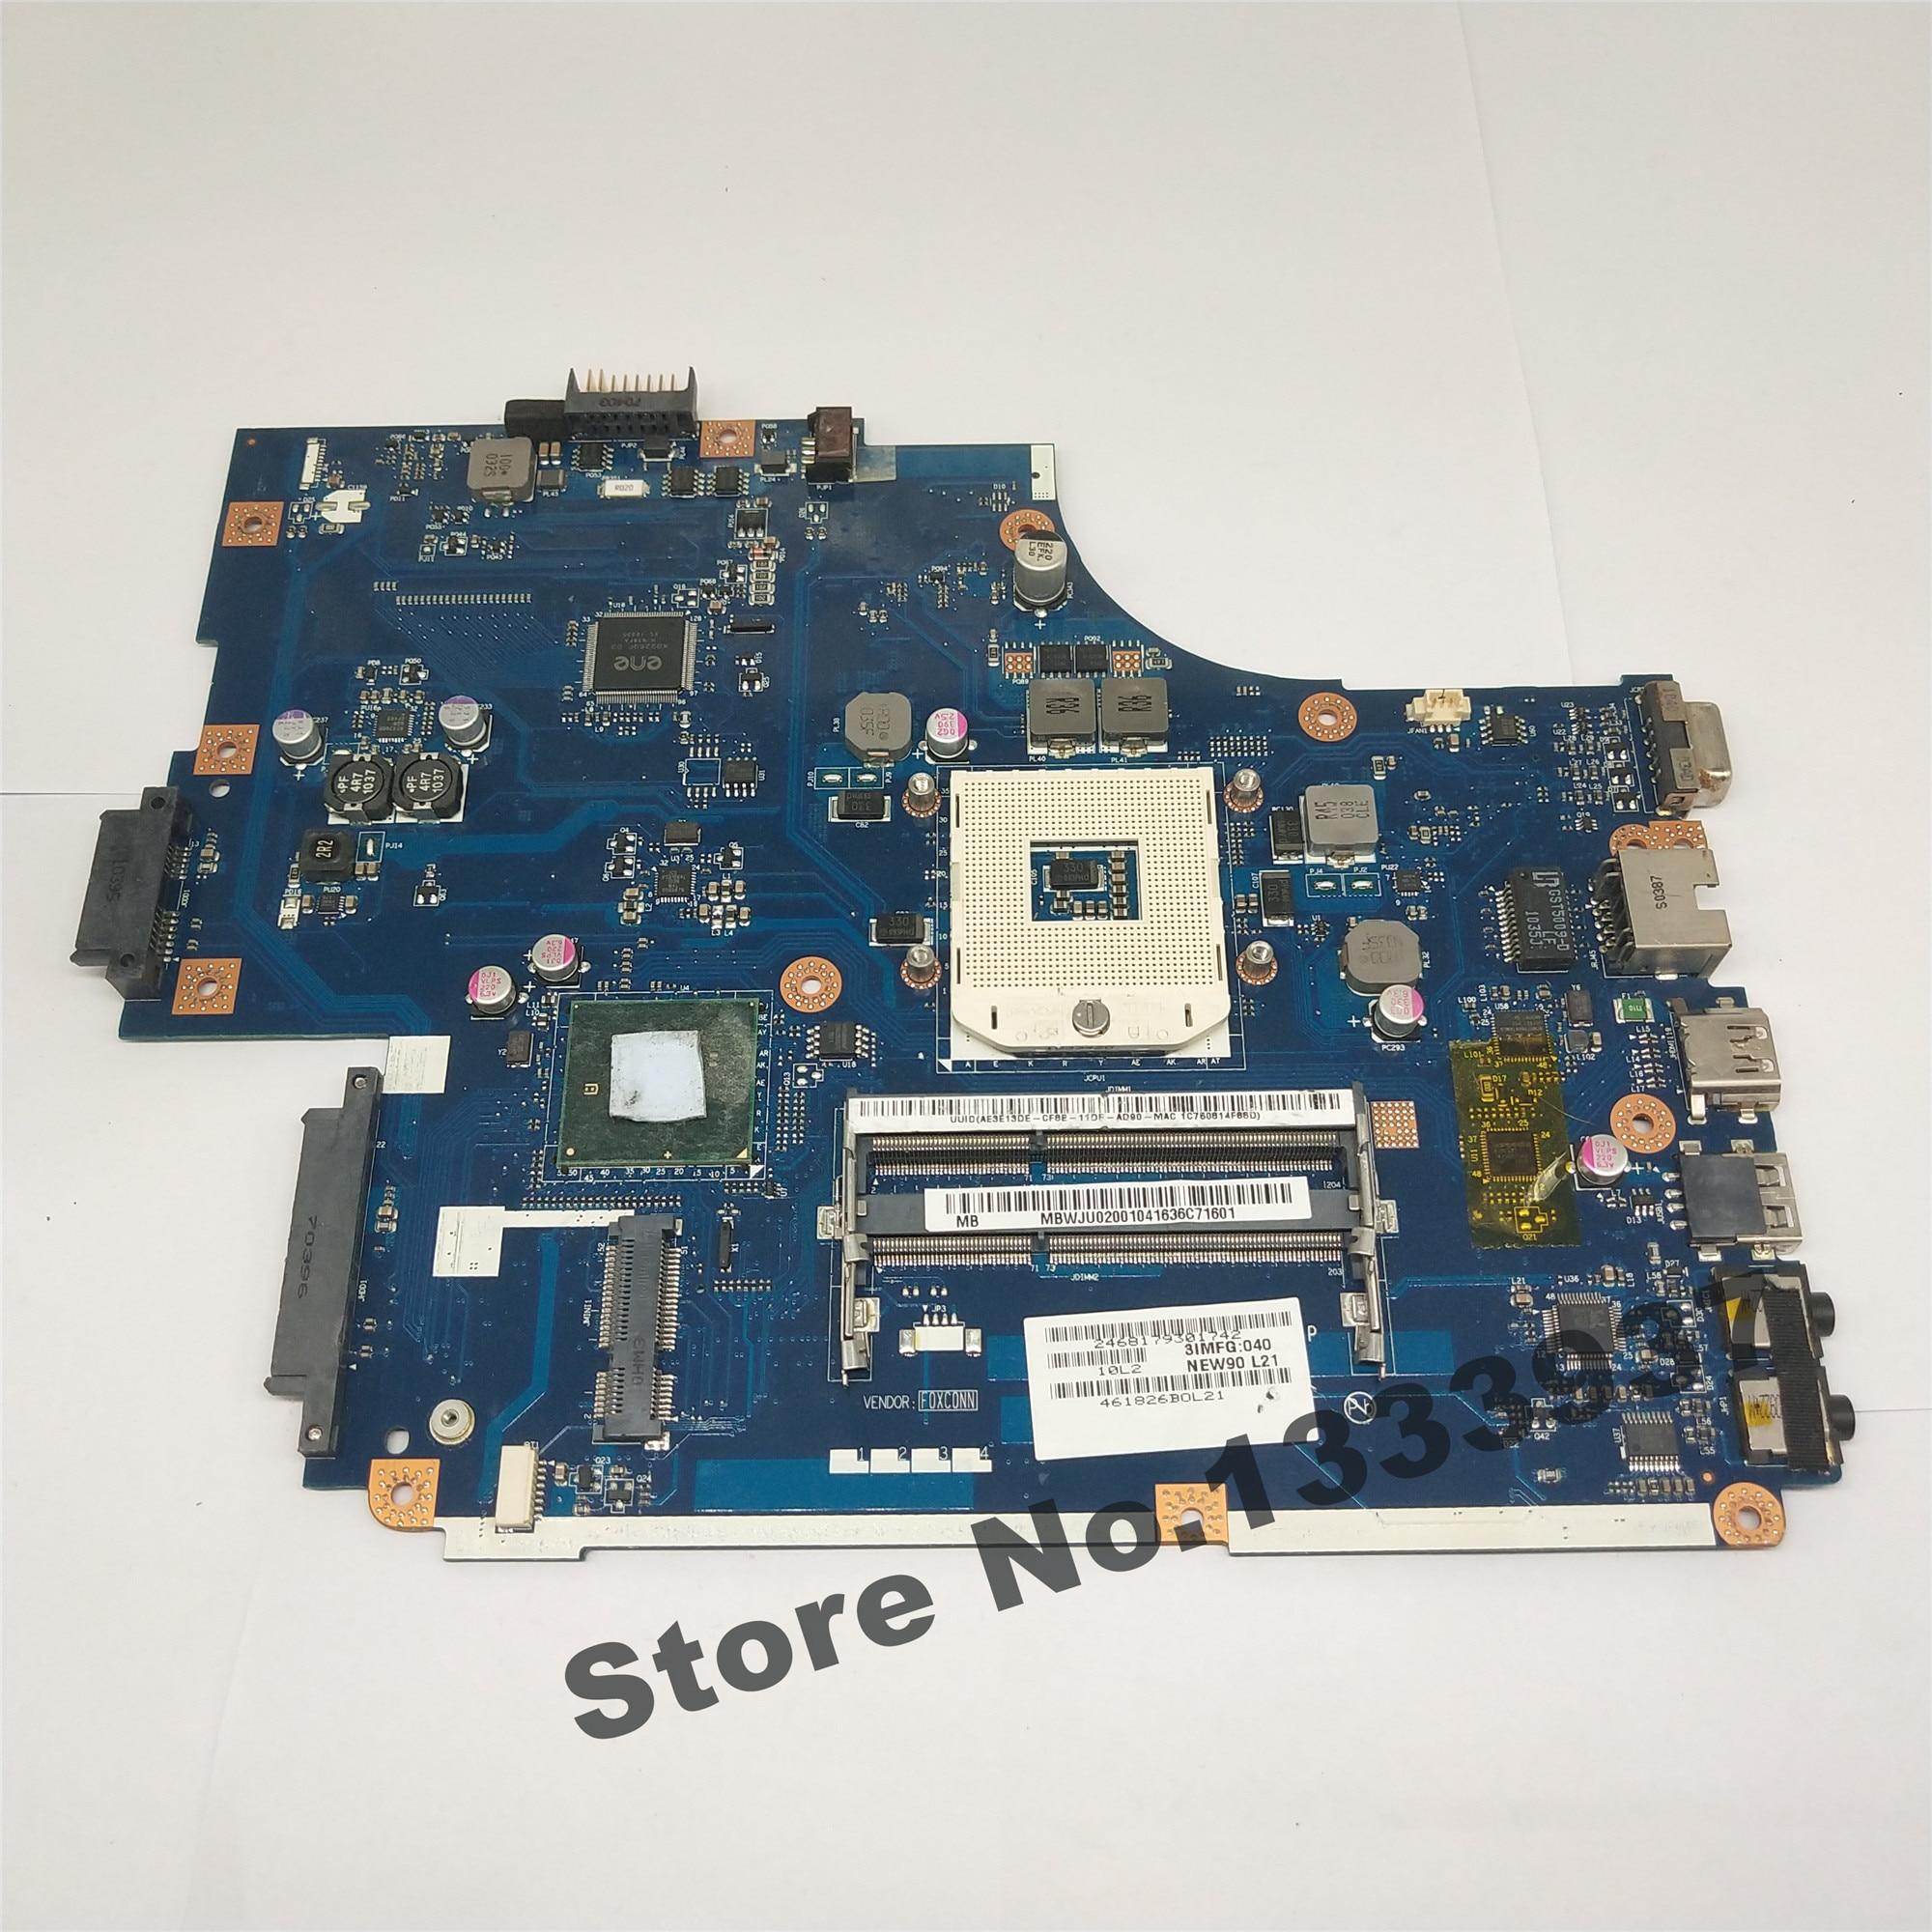 Placa base para portátil Acer aspire 5742 5742G 5741 NEW70 LA-5892P HM55 MBWJU02001 MB.WJU02.001